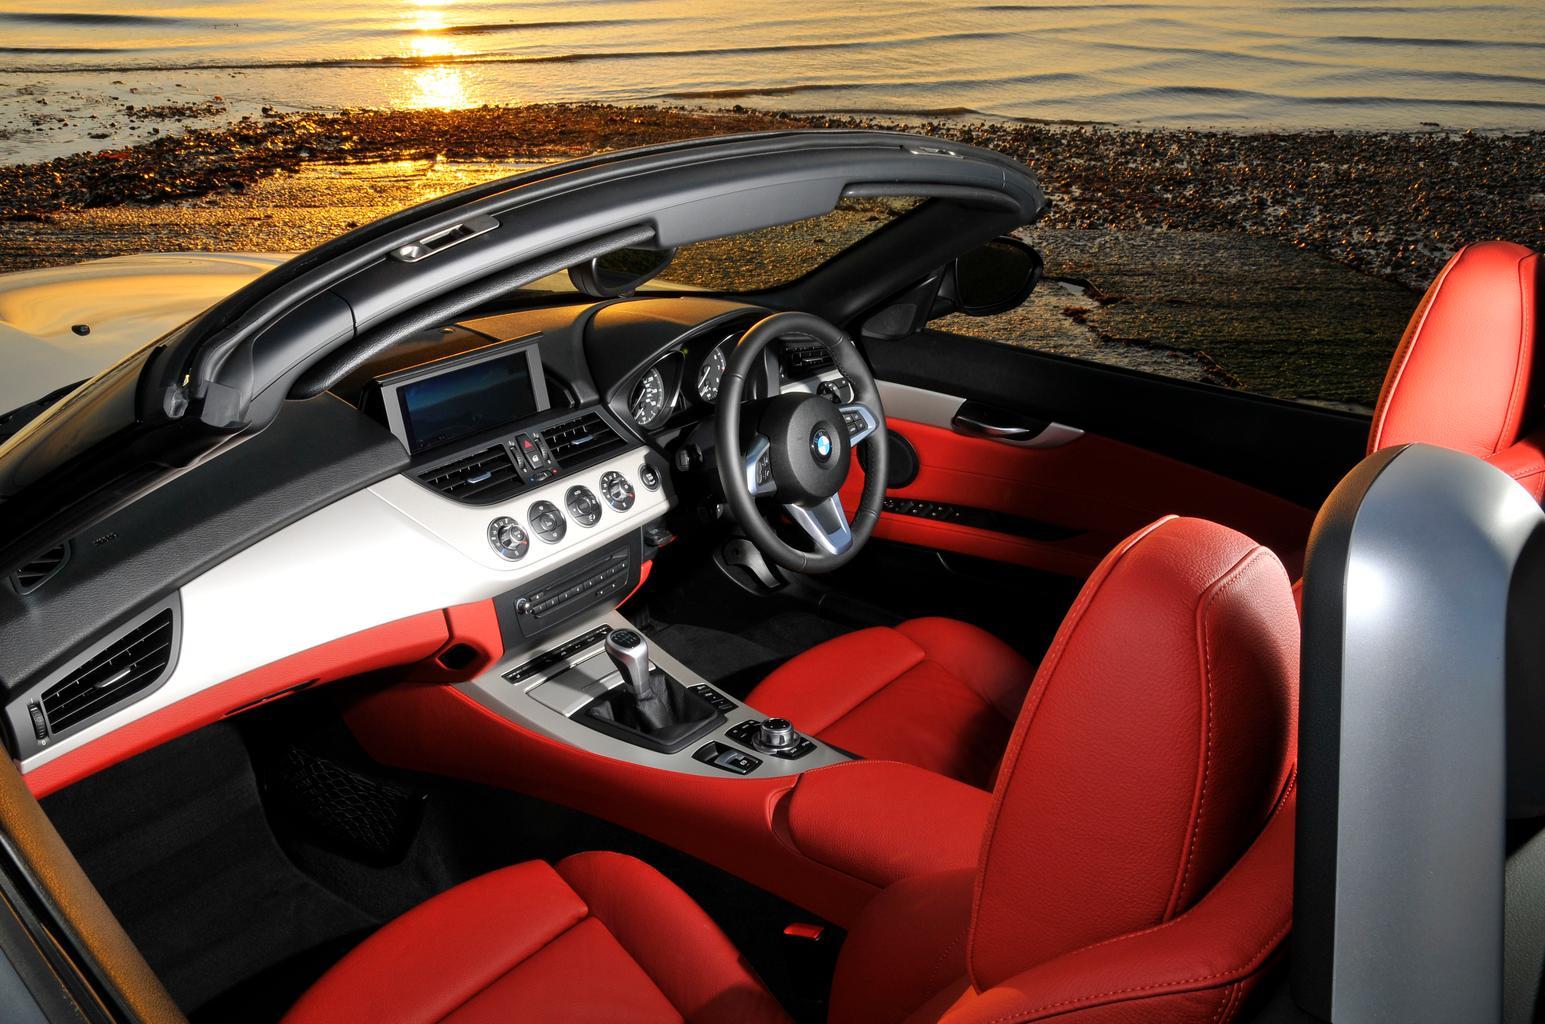 Used test – fun in the sun: Audi TT Roadster vs BMW Z4